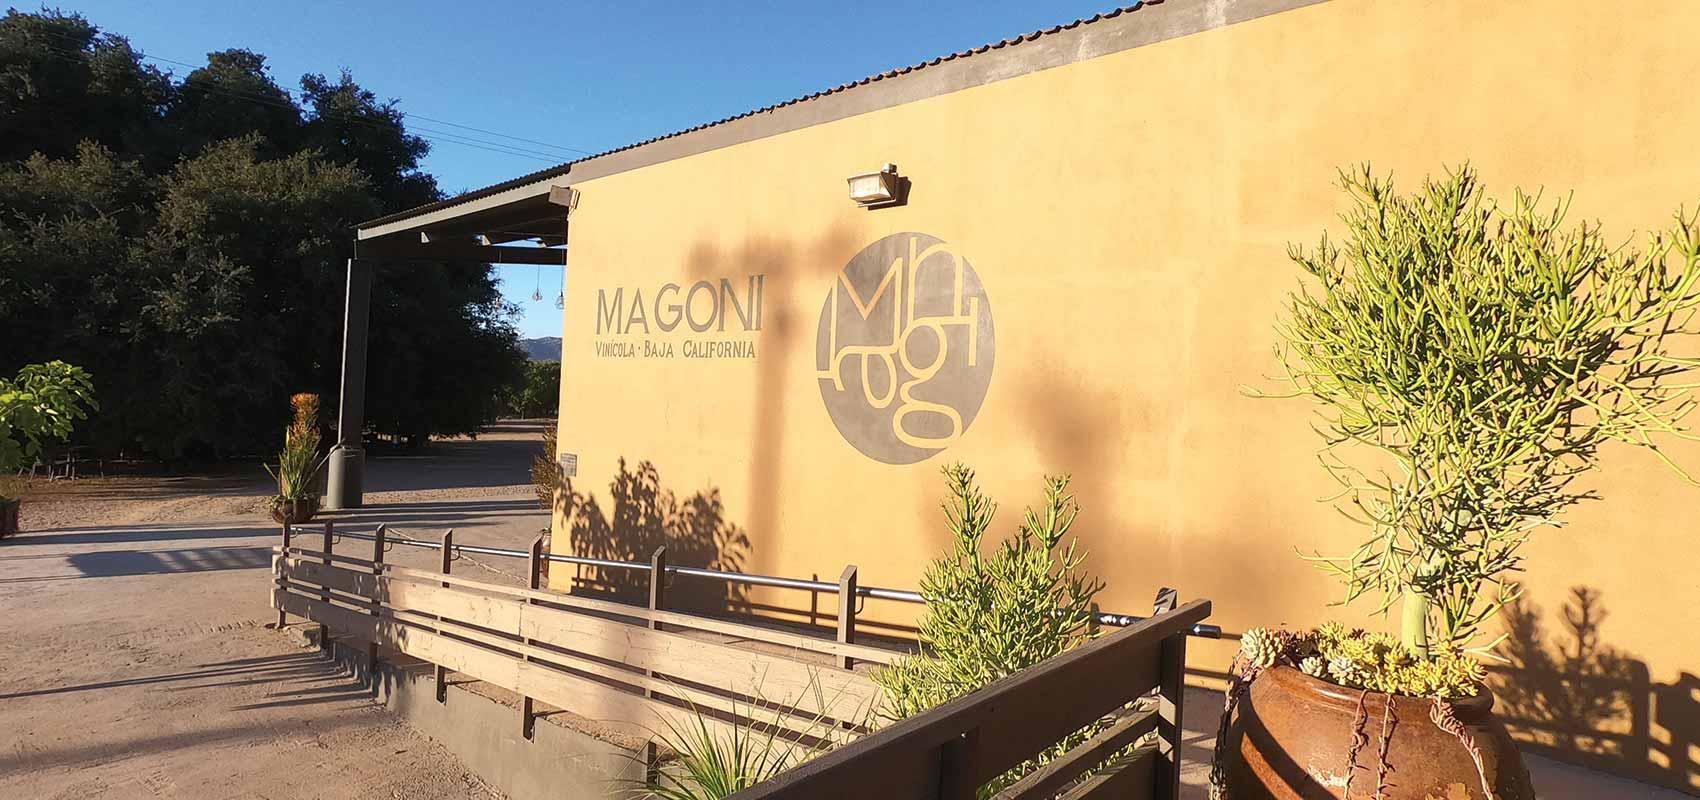 Casa Magoni Vineyard